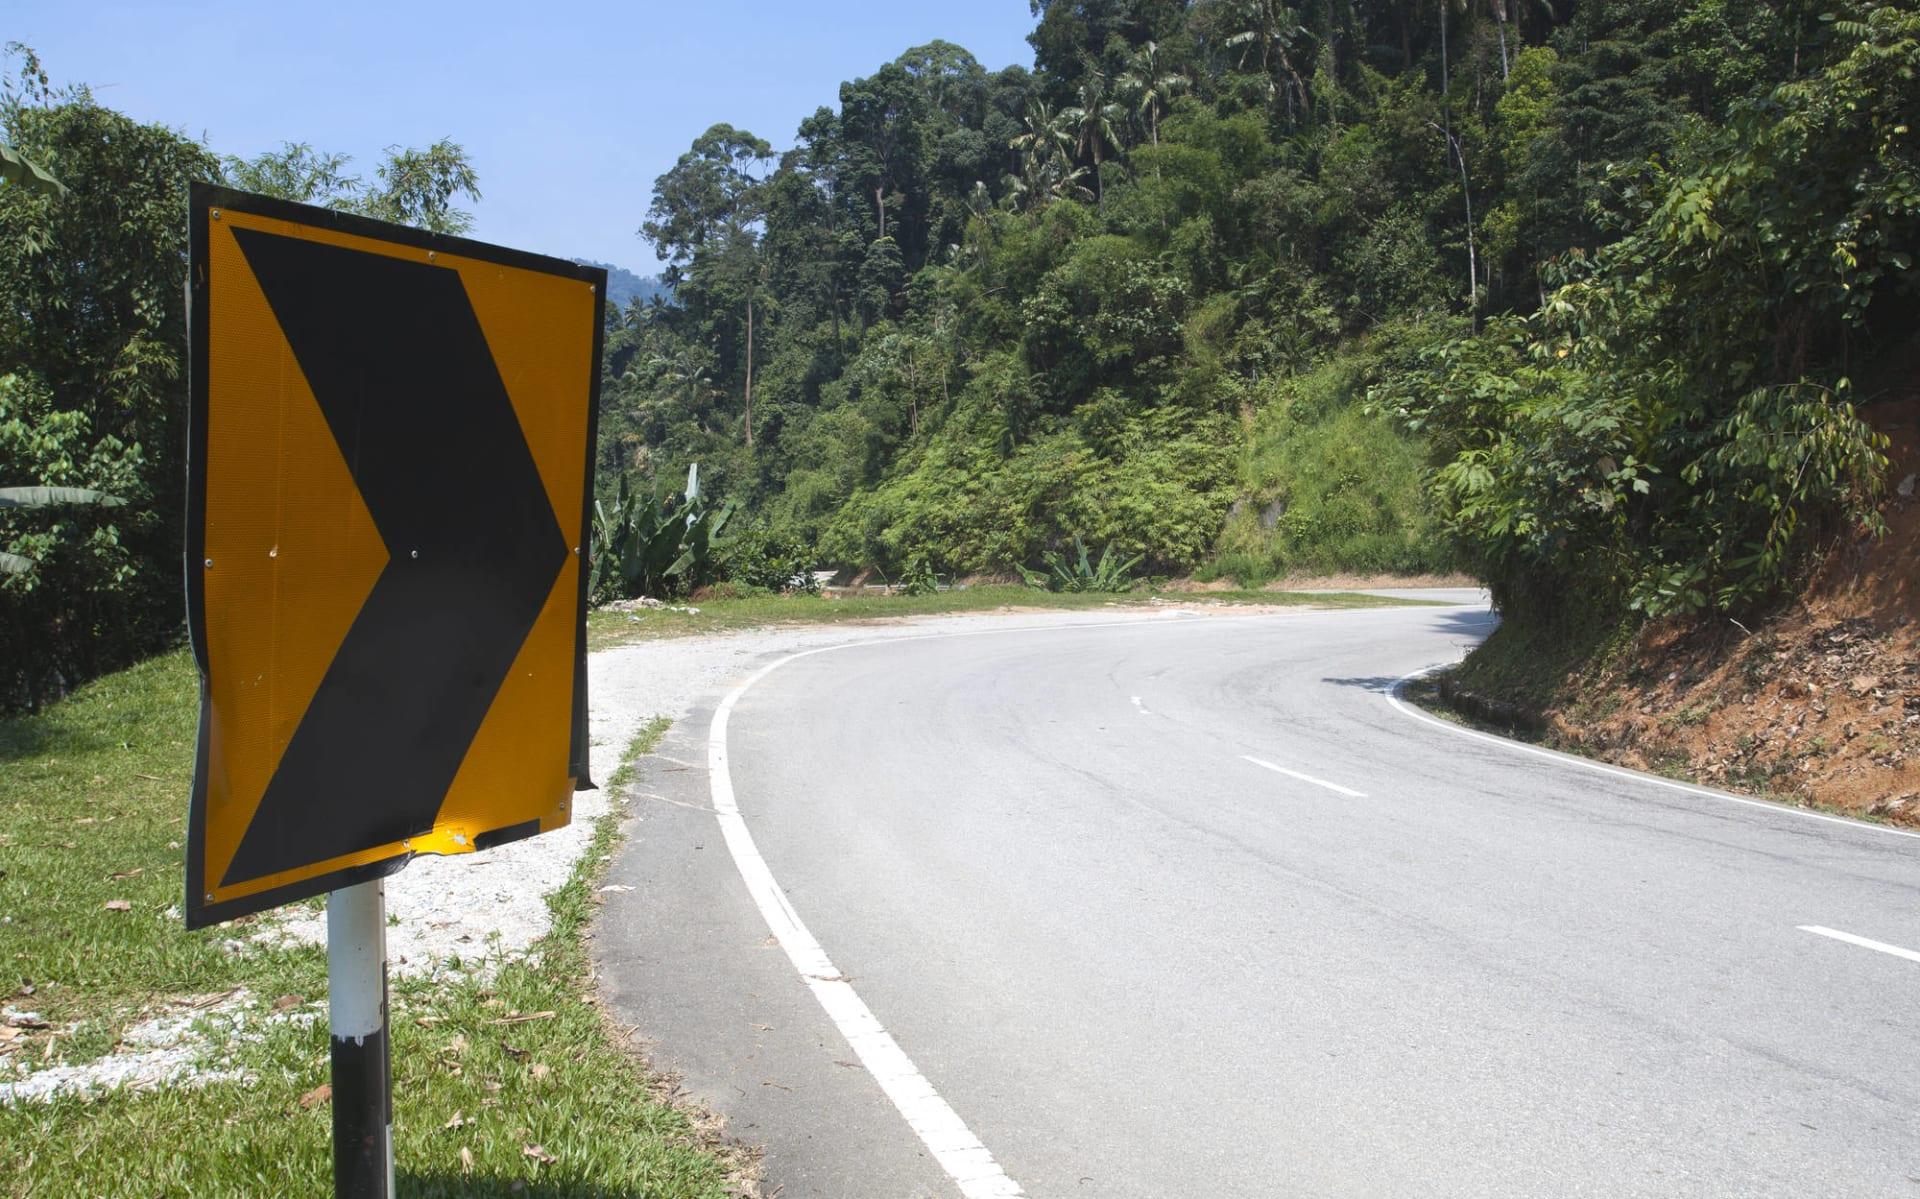 Malaysia - Grosse Mietwagenrundreise - SIN-PEN ab Kuala Lumpur: Malaysia Cameron Highlands Road Sign